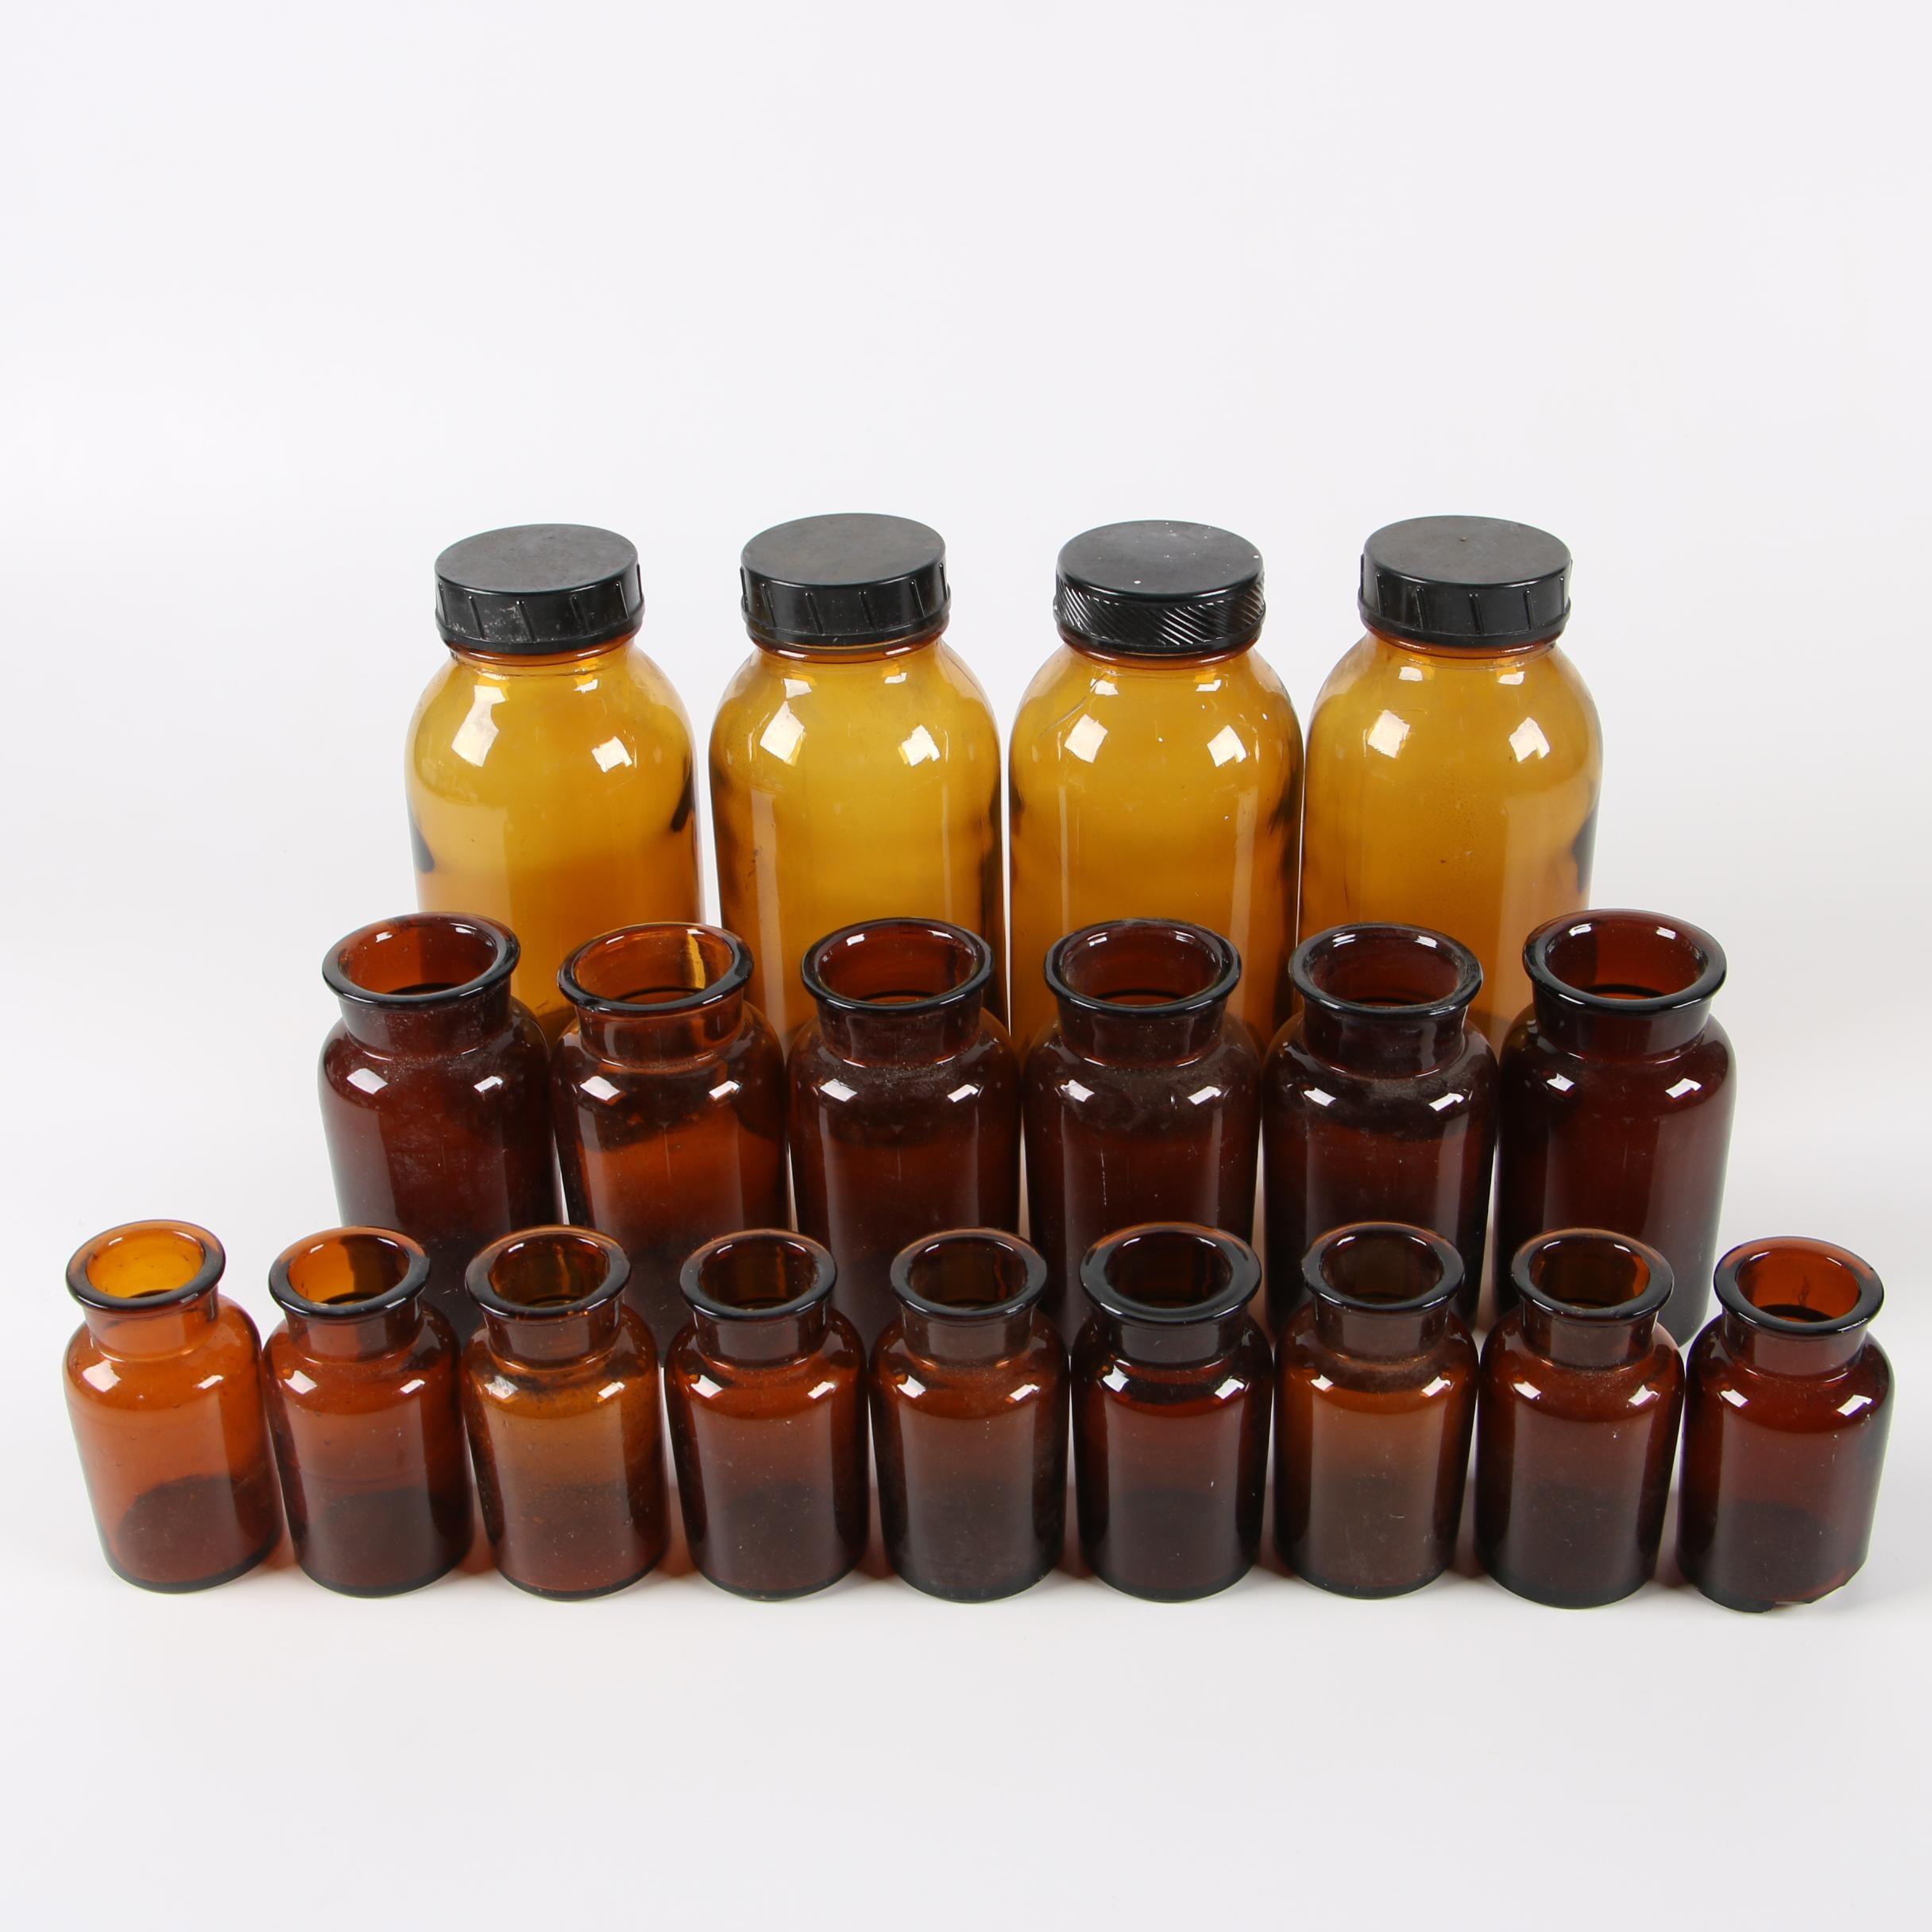 Czechoslovakian Amber Glass Apothecary Jars, Mid-Century